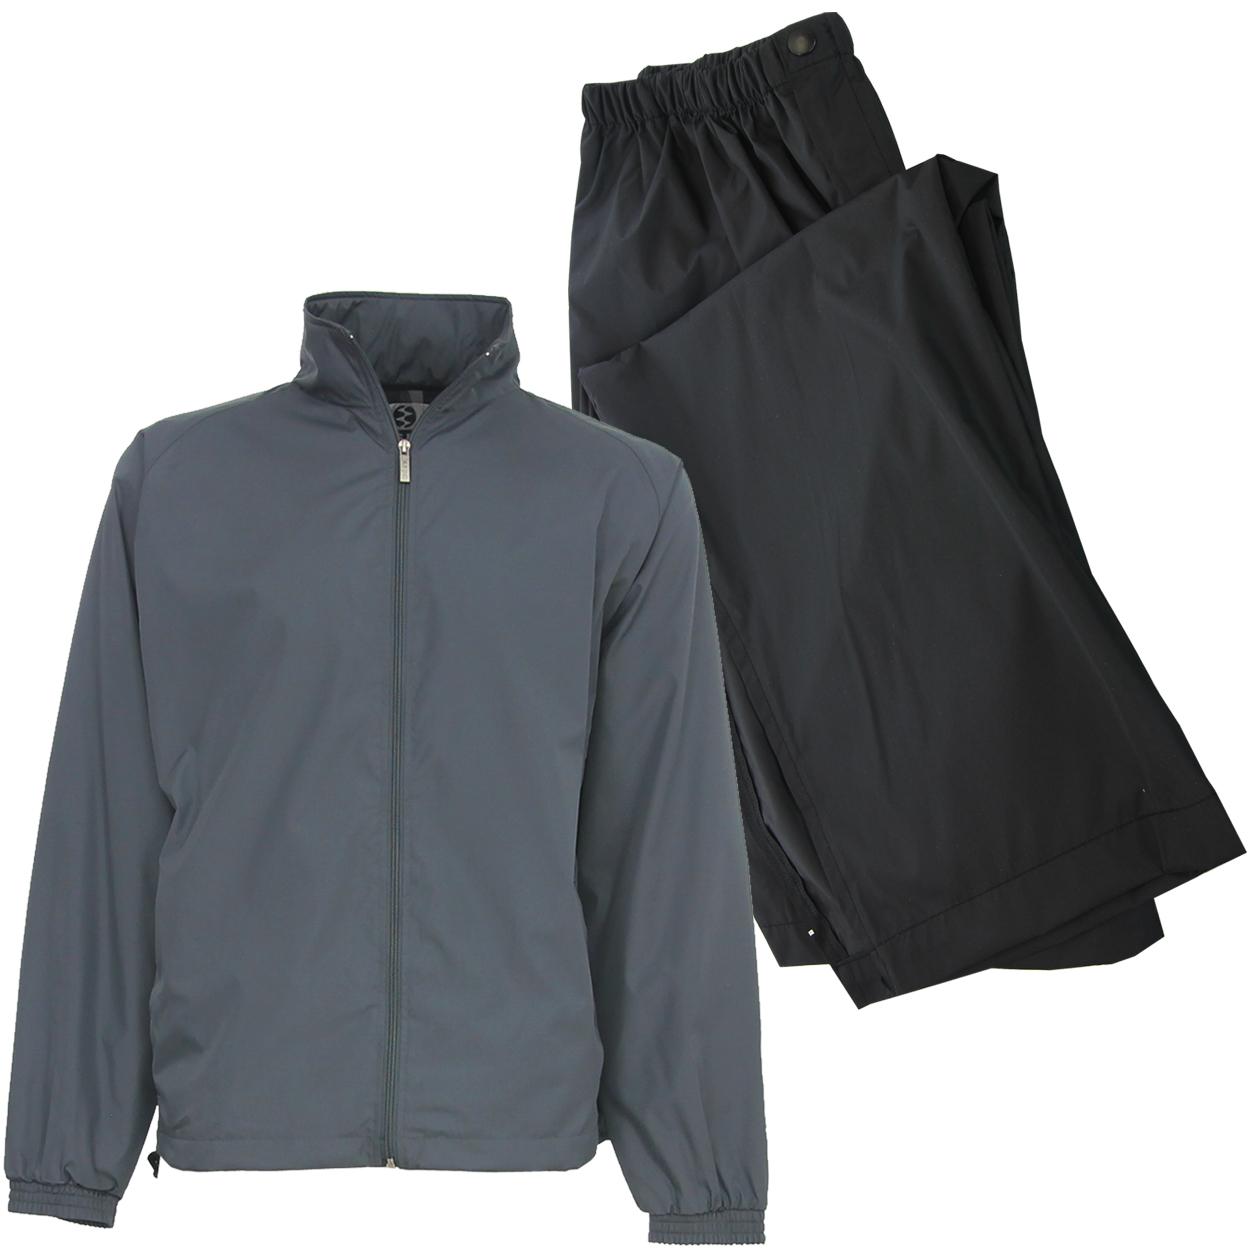 IXSPA Men's Packable Breathable Waterproof Golf Rain Suit...